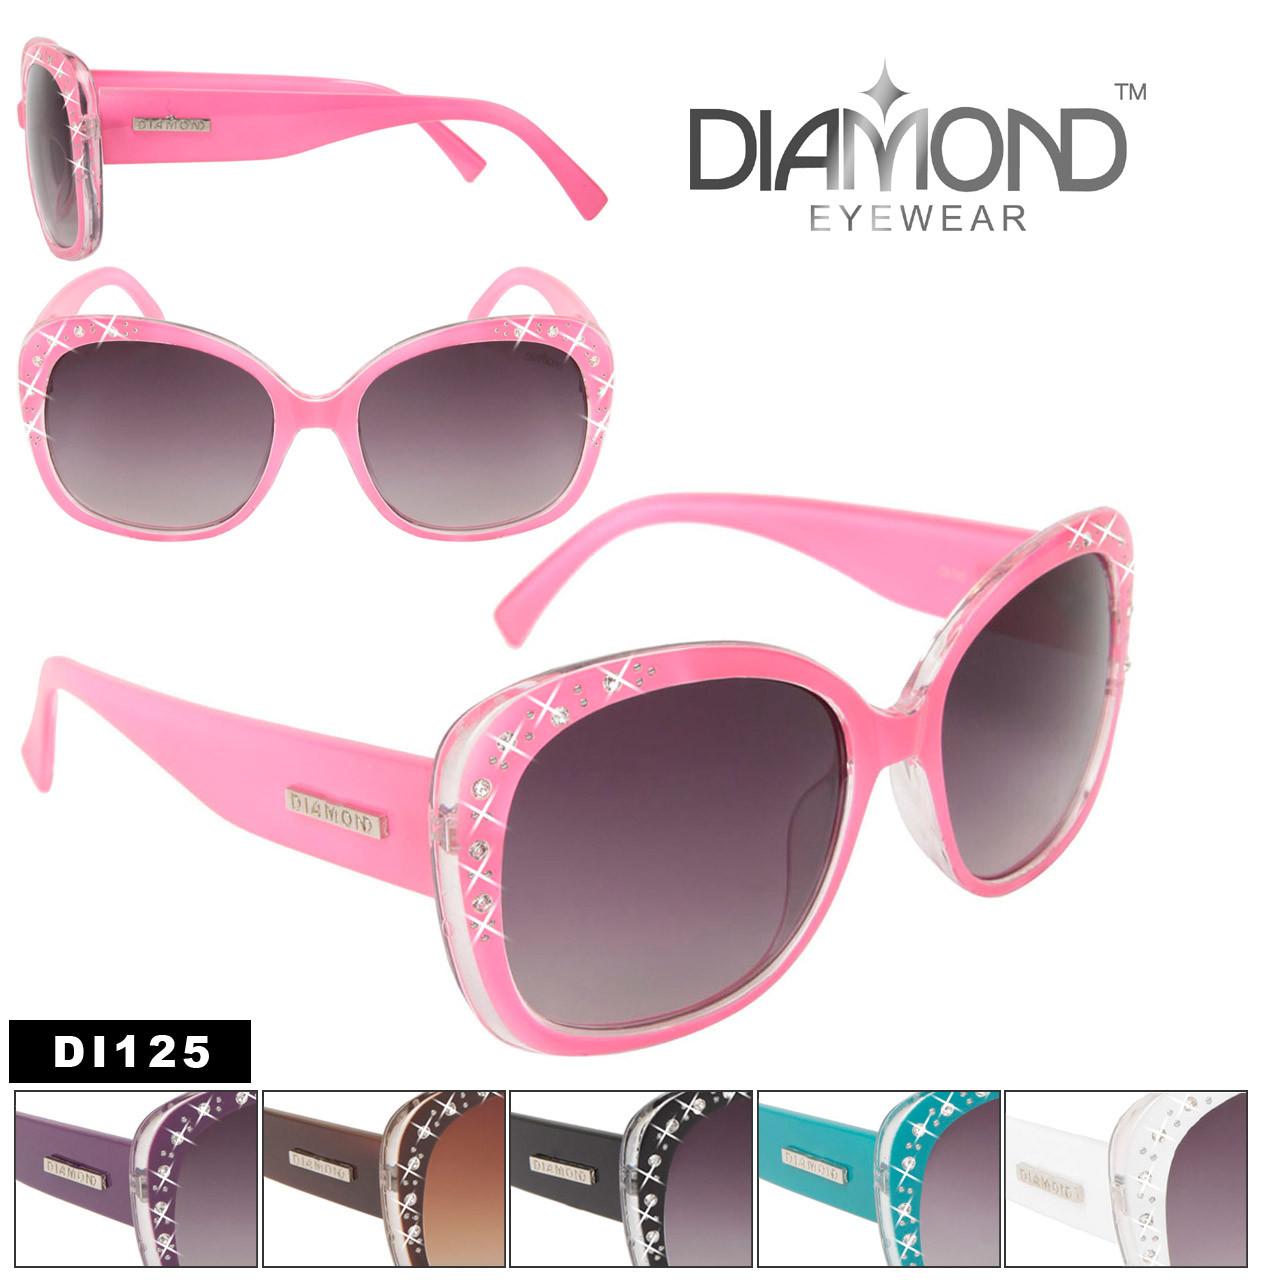 DI125 Sparkling Rhinestone Sunglasses by Diamond